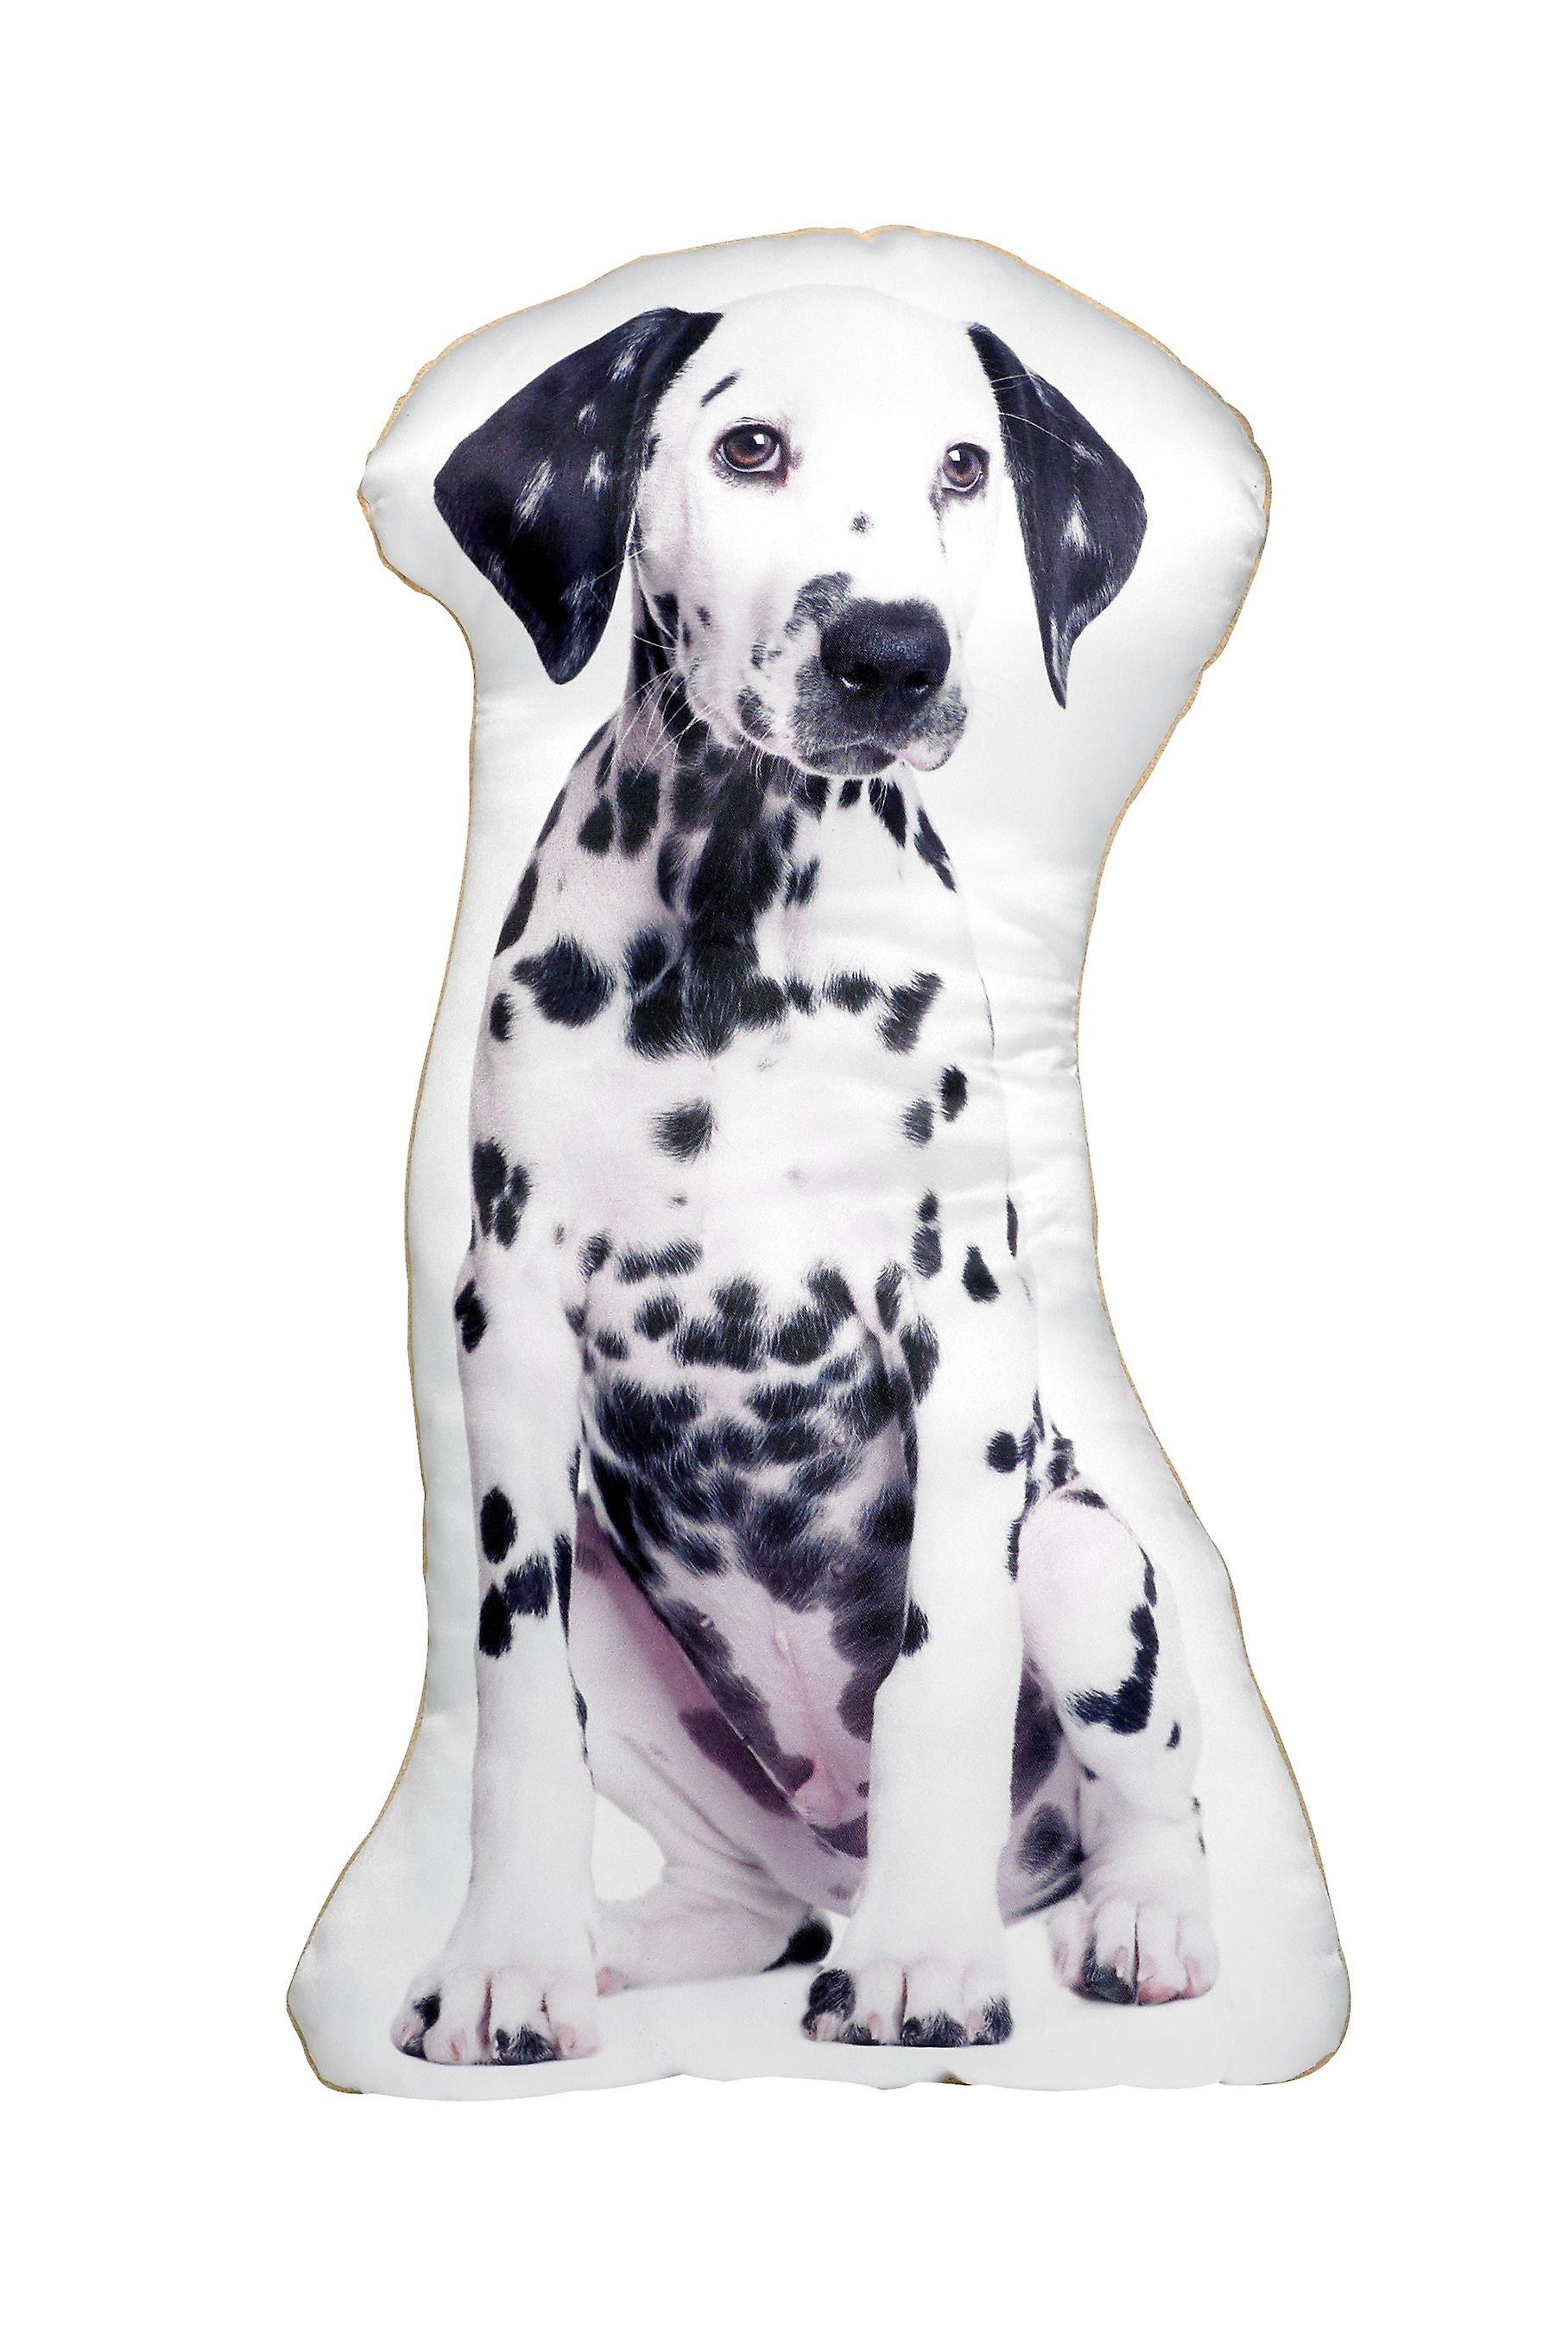 Adorable dalmatian shaped cushion